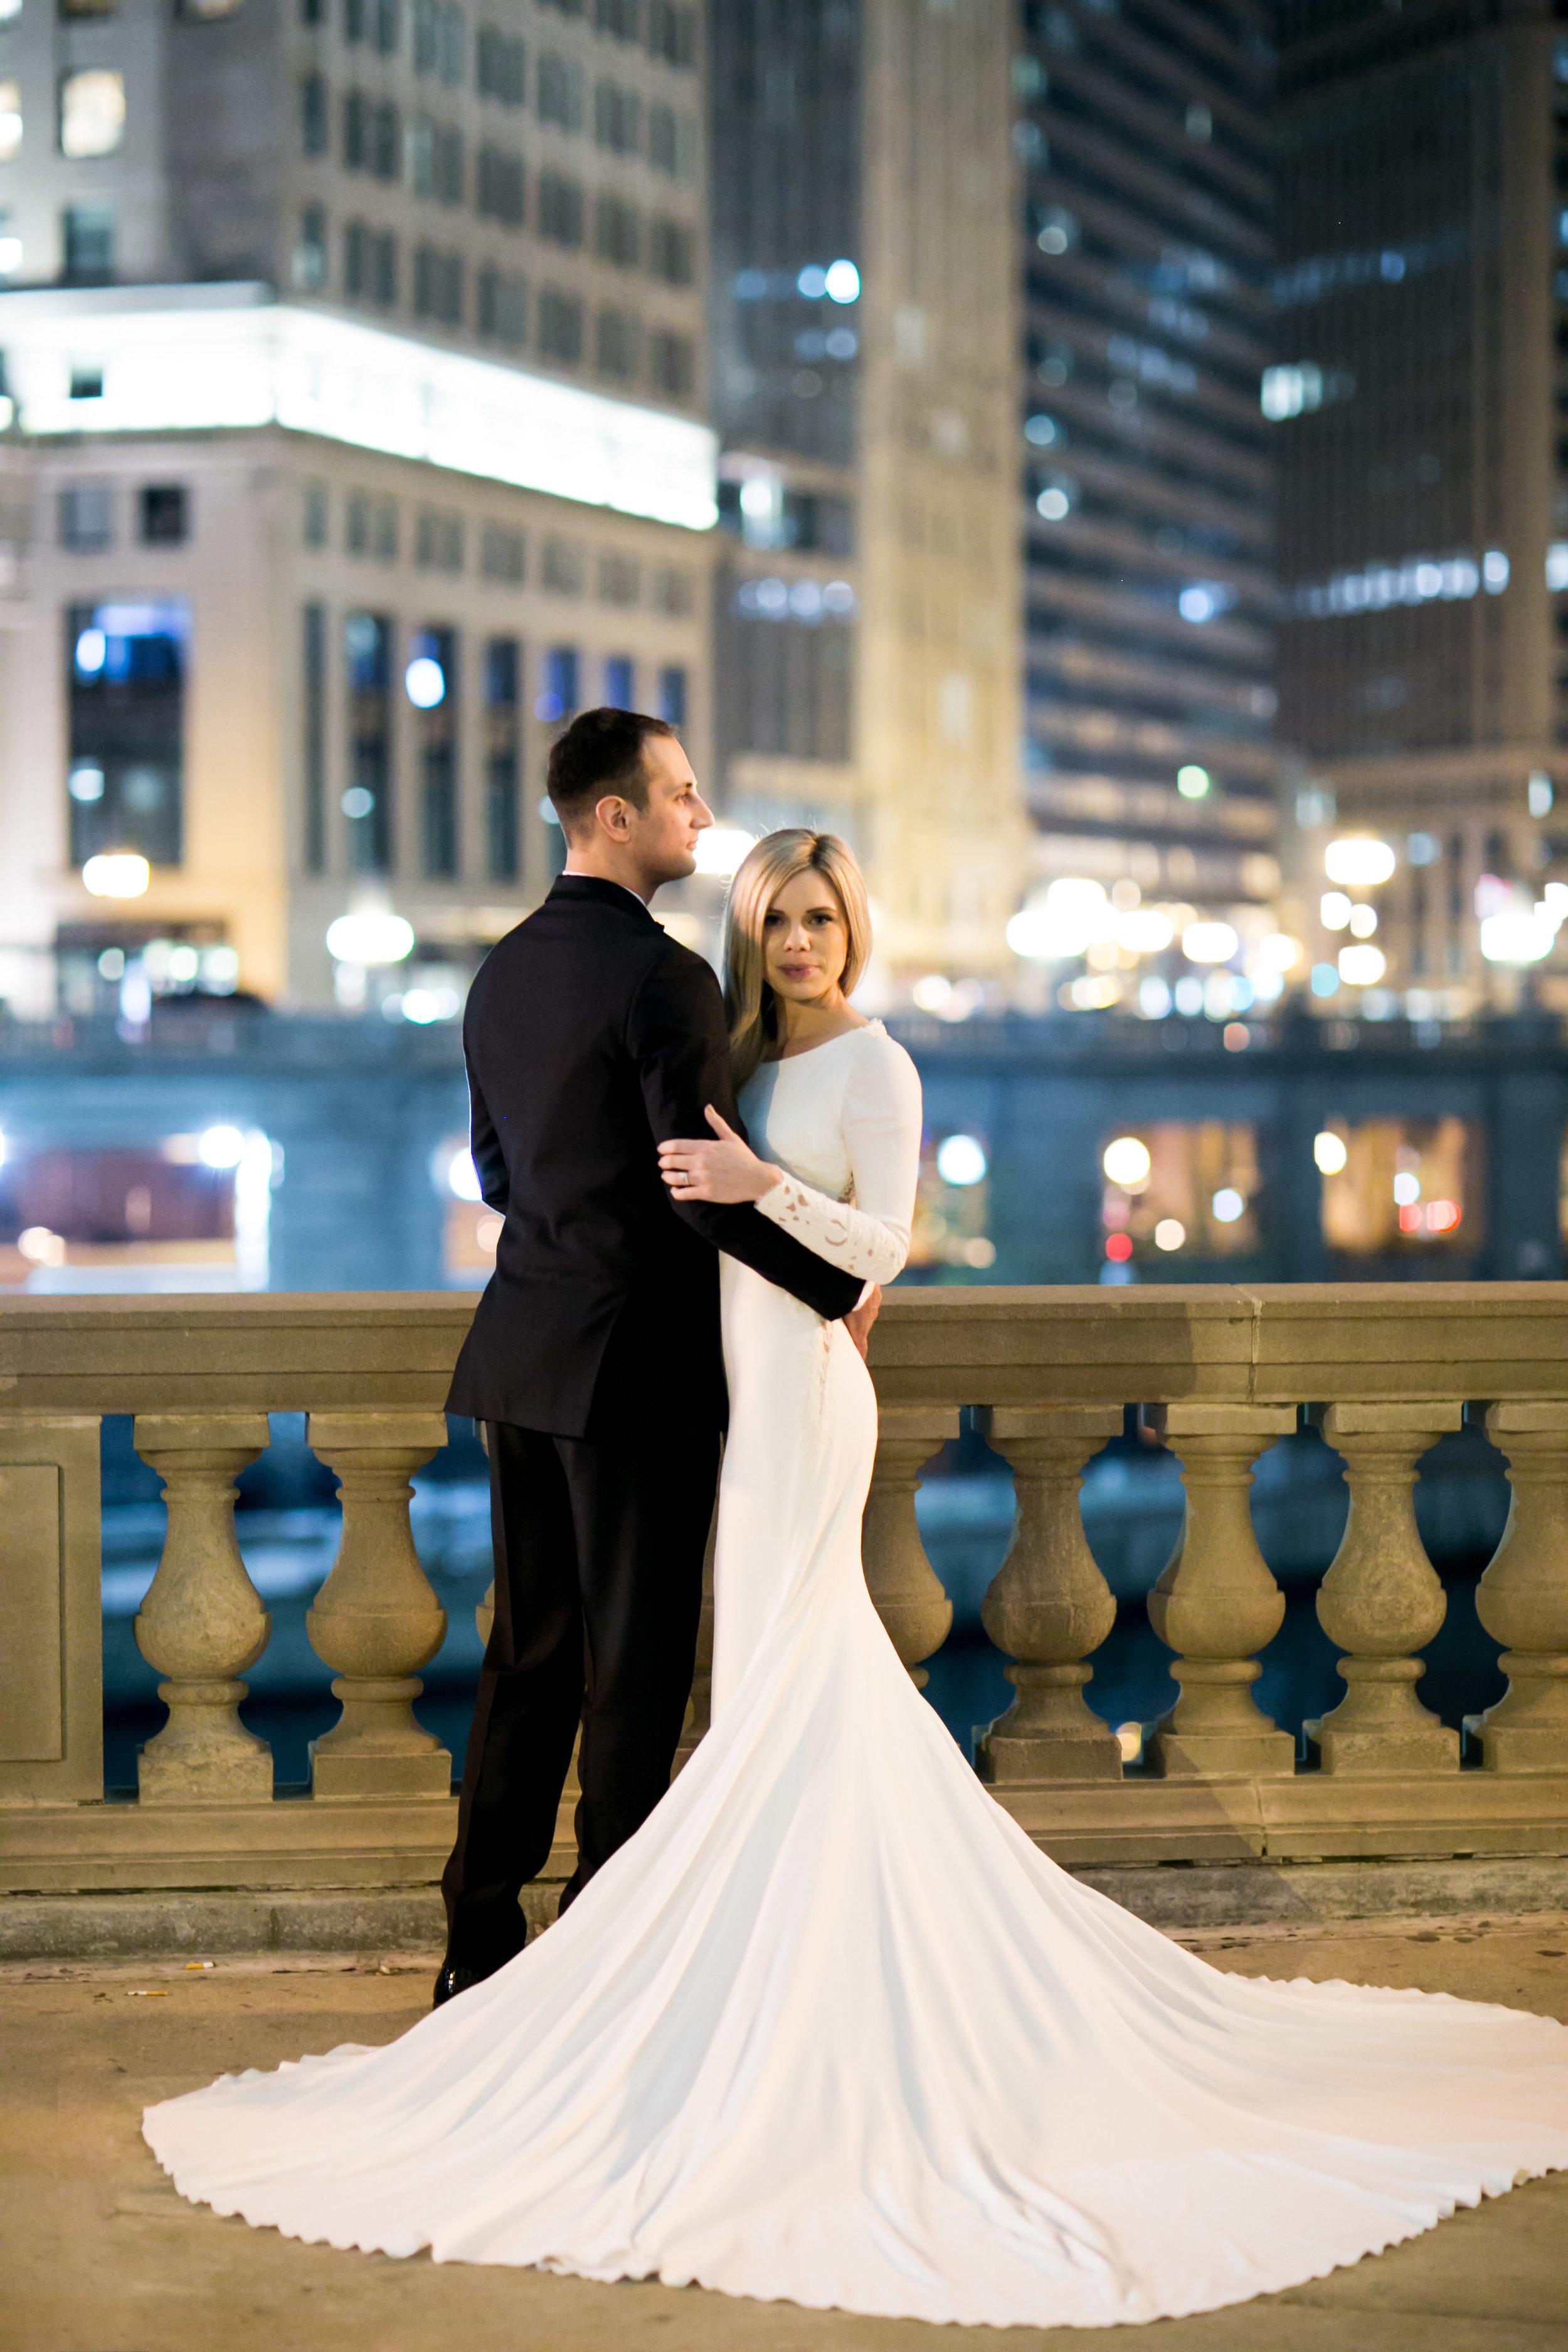 LisaDiederichPhotography_Meghan&Pete_ChicagoWedding_Blog-36.jpg